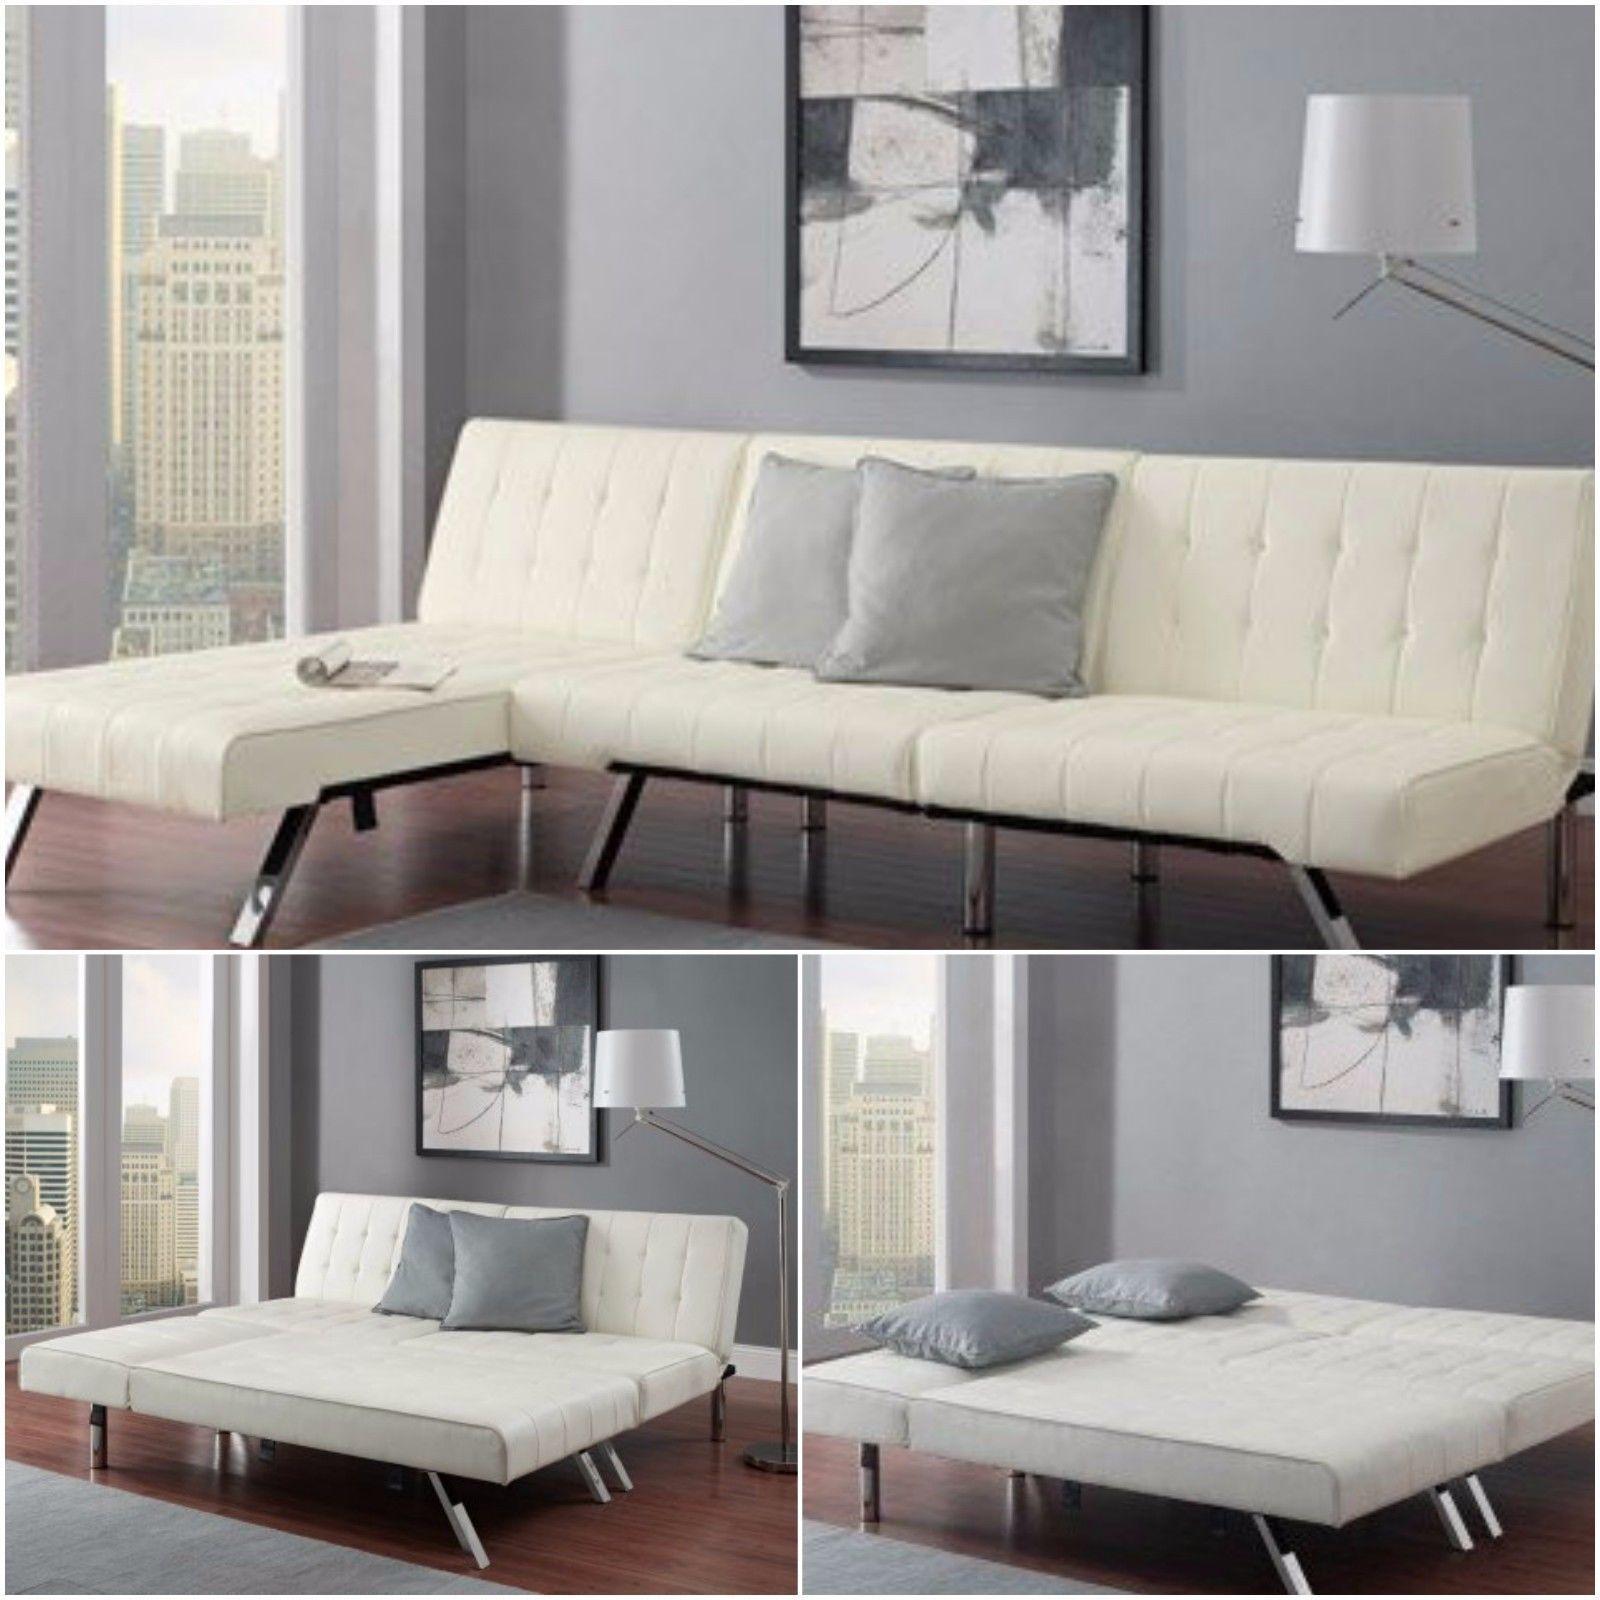 Modern Comfortable L Shaped Convertible Sofa Bed Sleeper